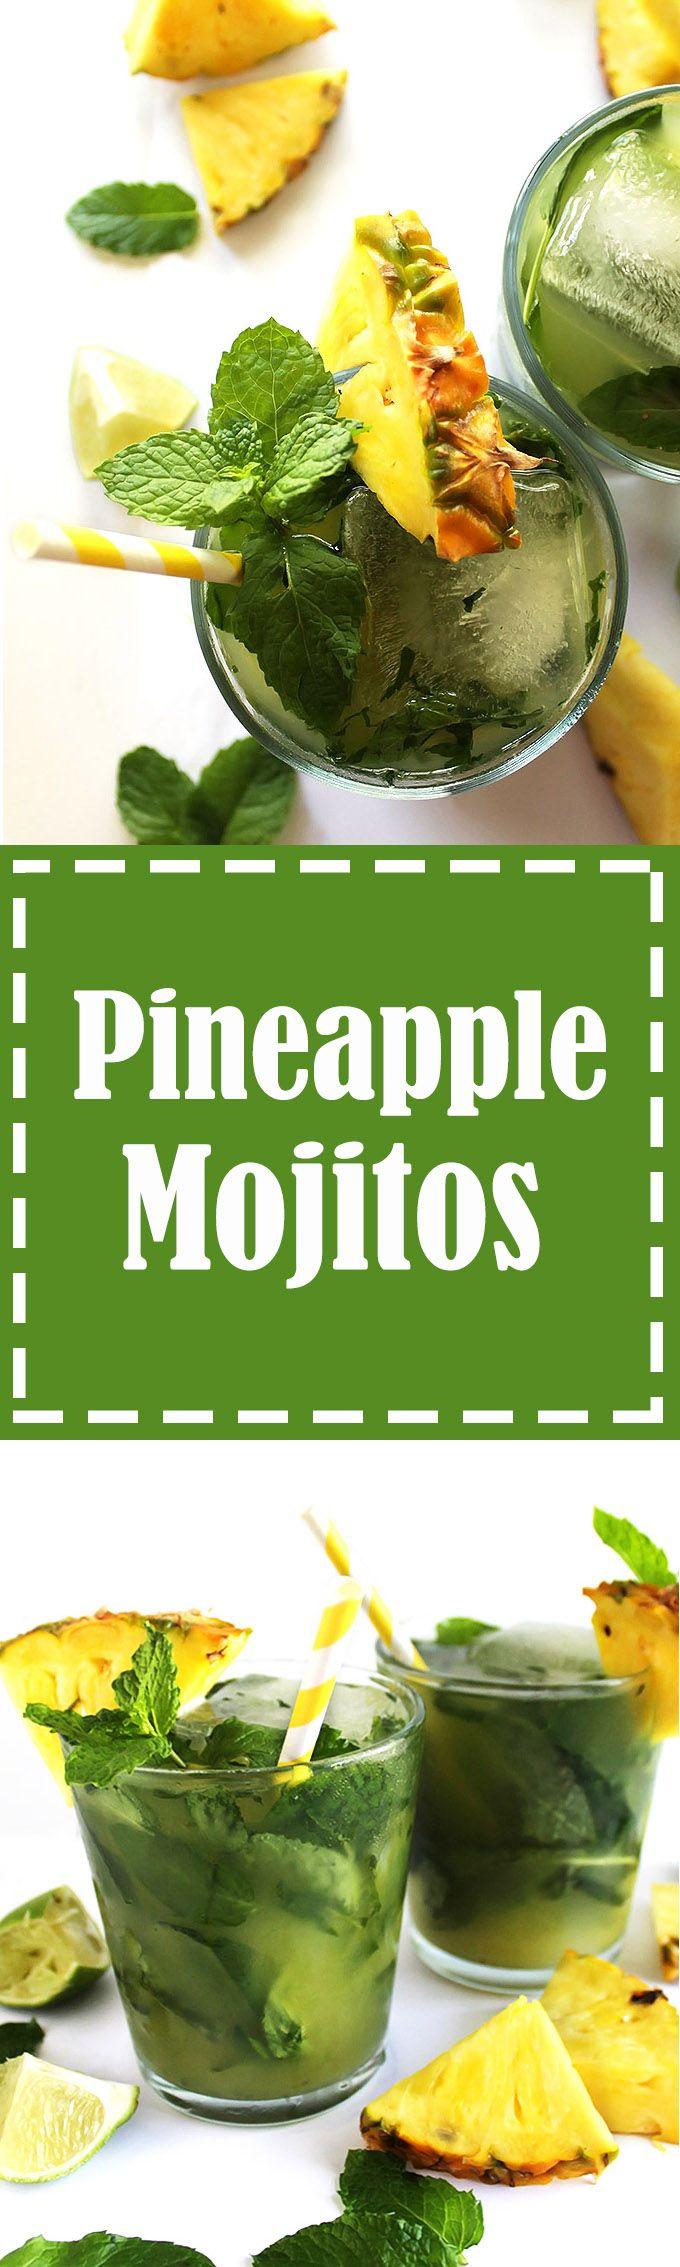 Pineapple Mojitos - Refreshing mojitos that are slightly sweet, heavy ...